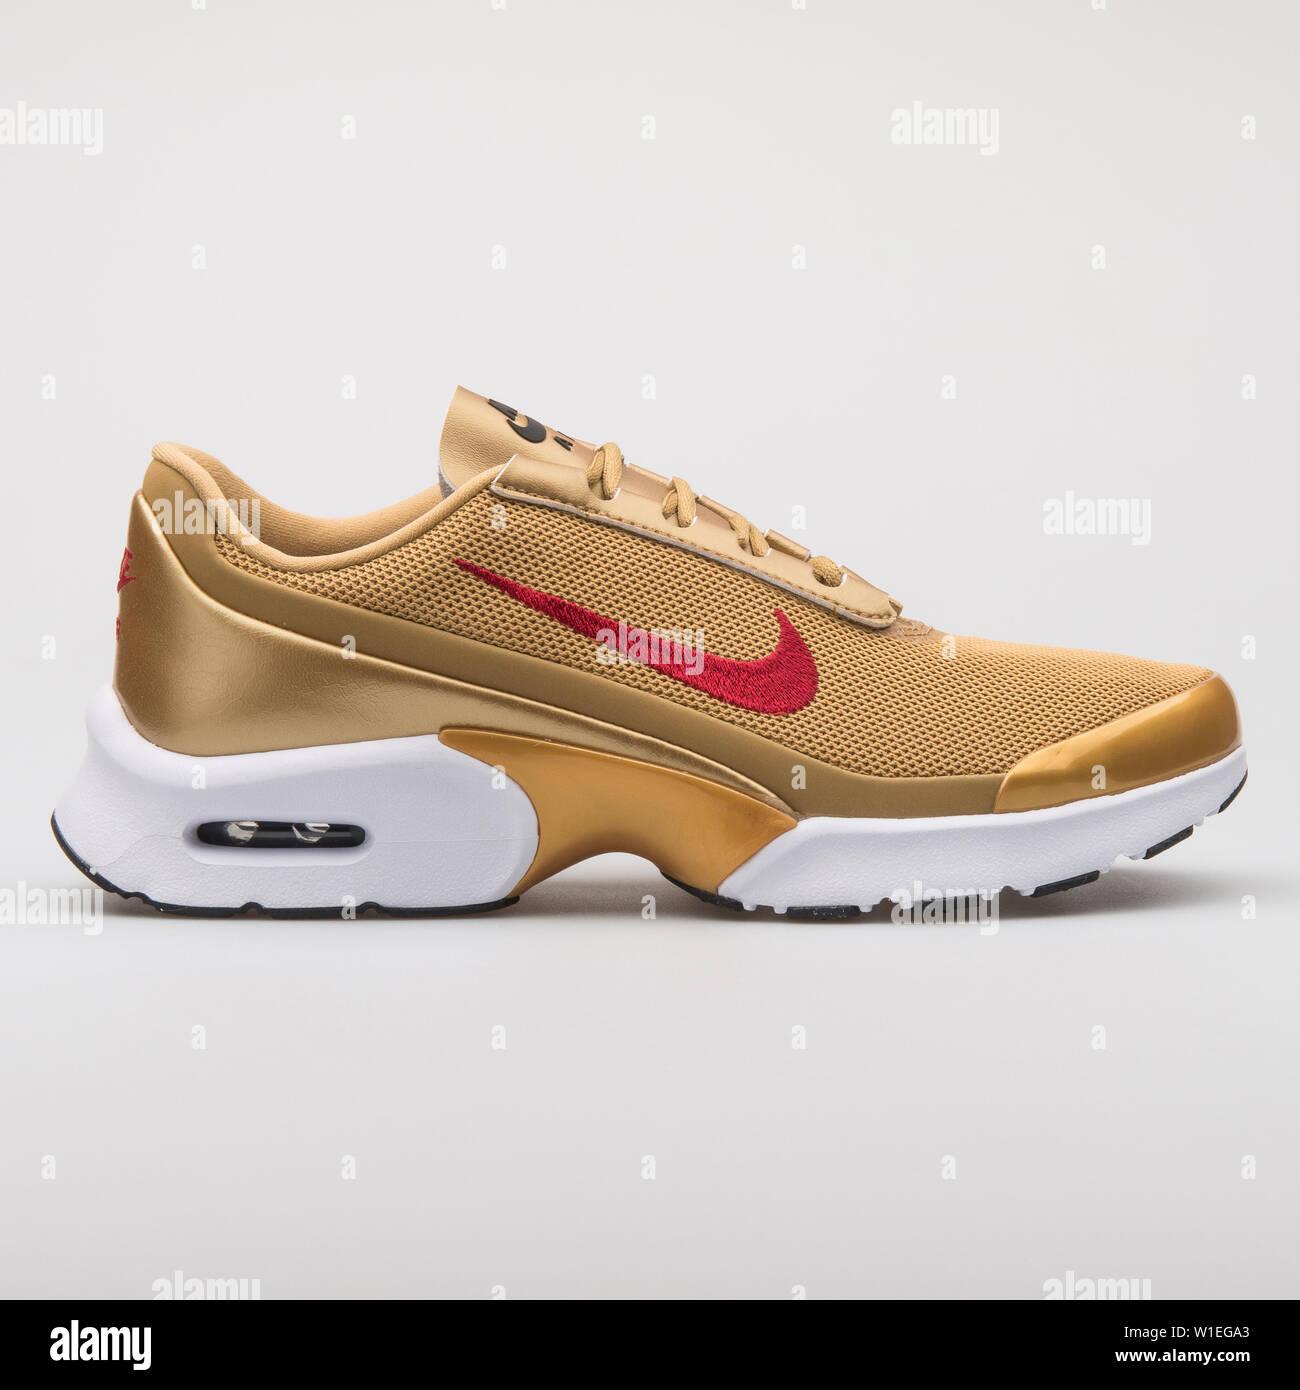 nike air max gold 2017